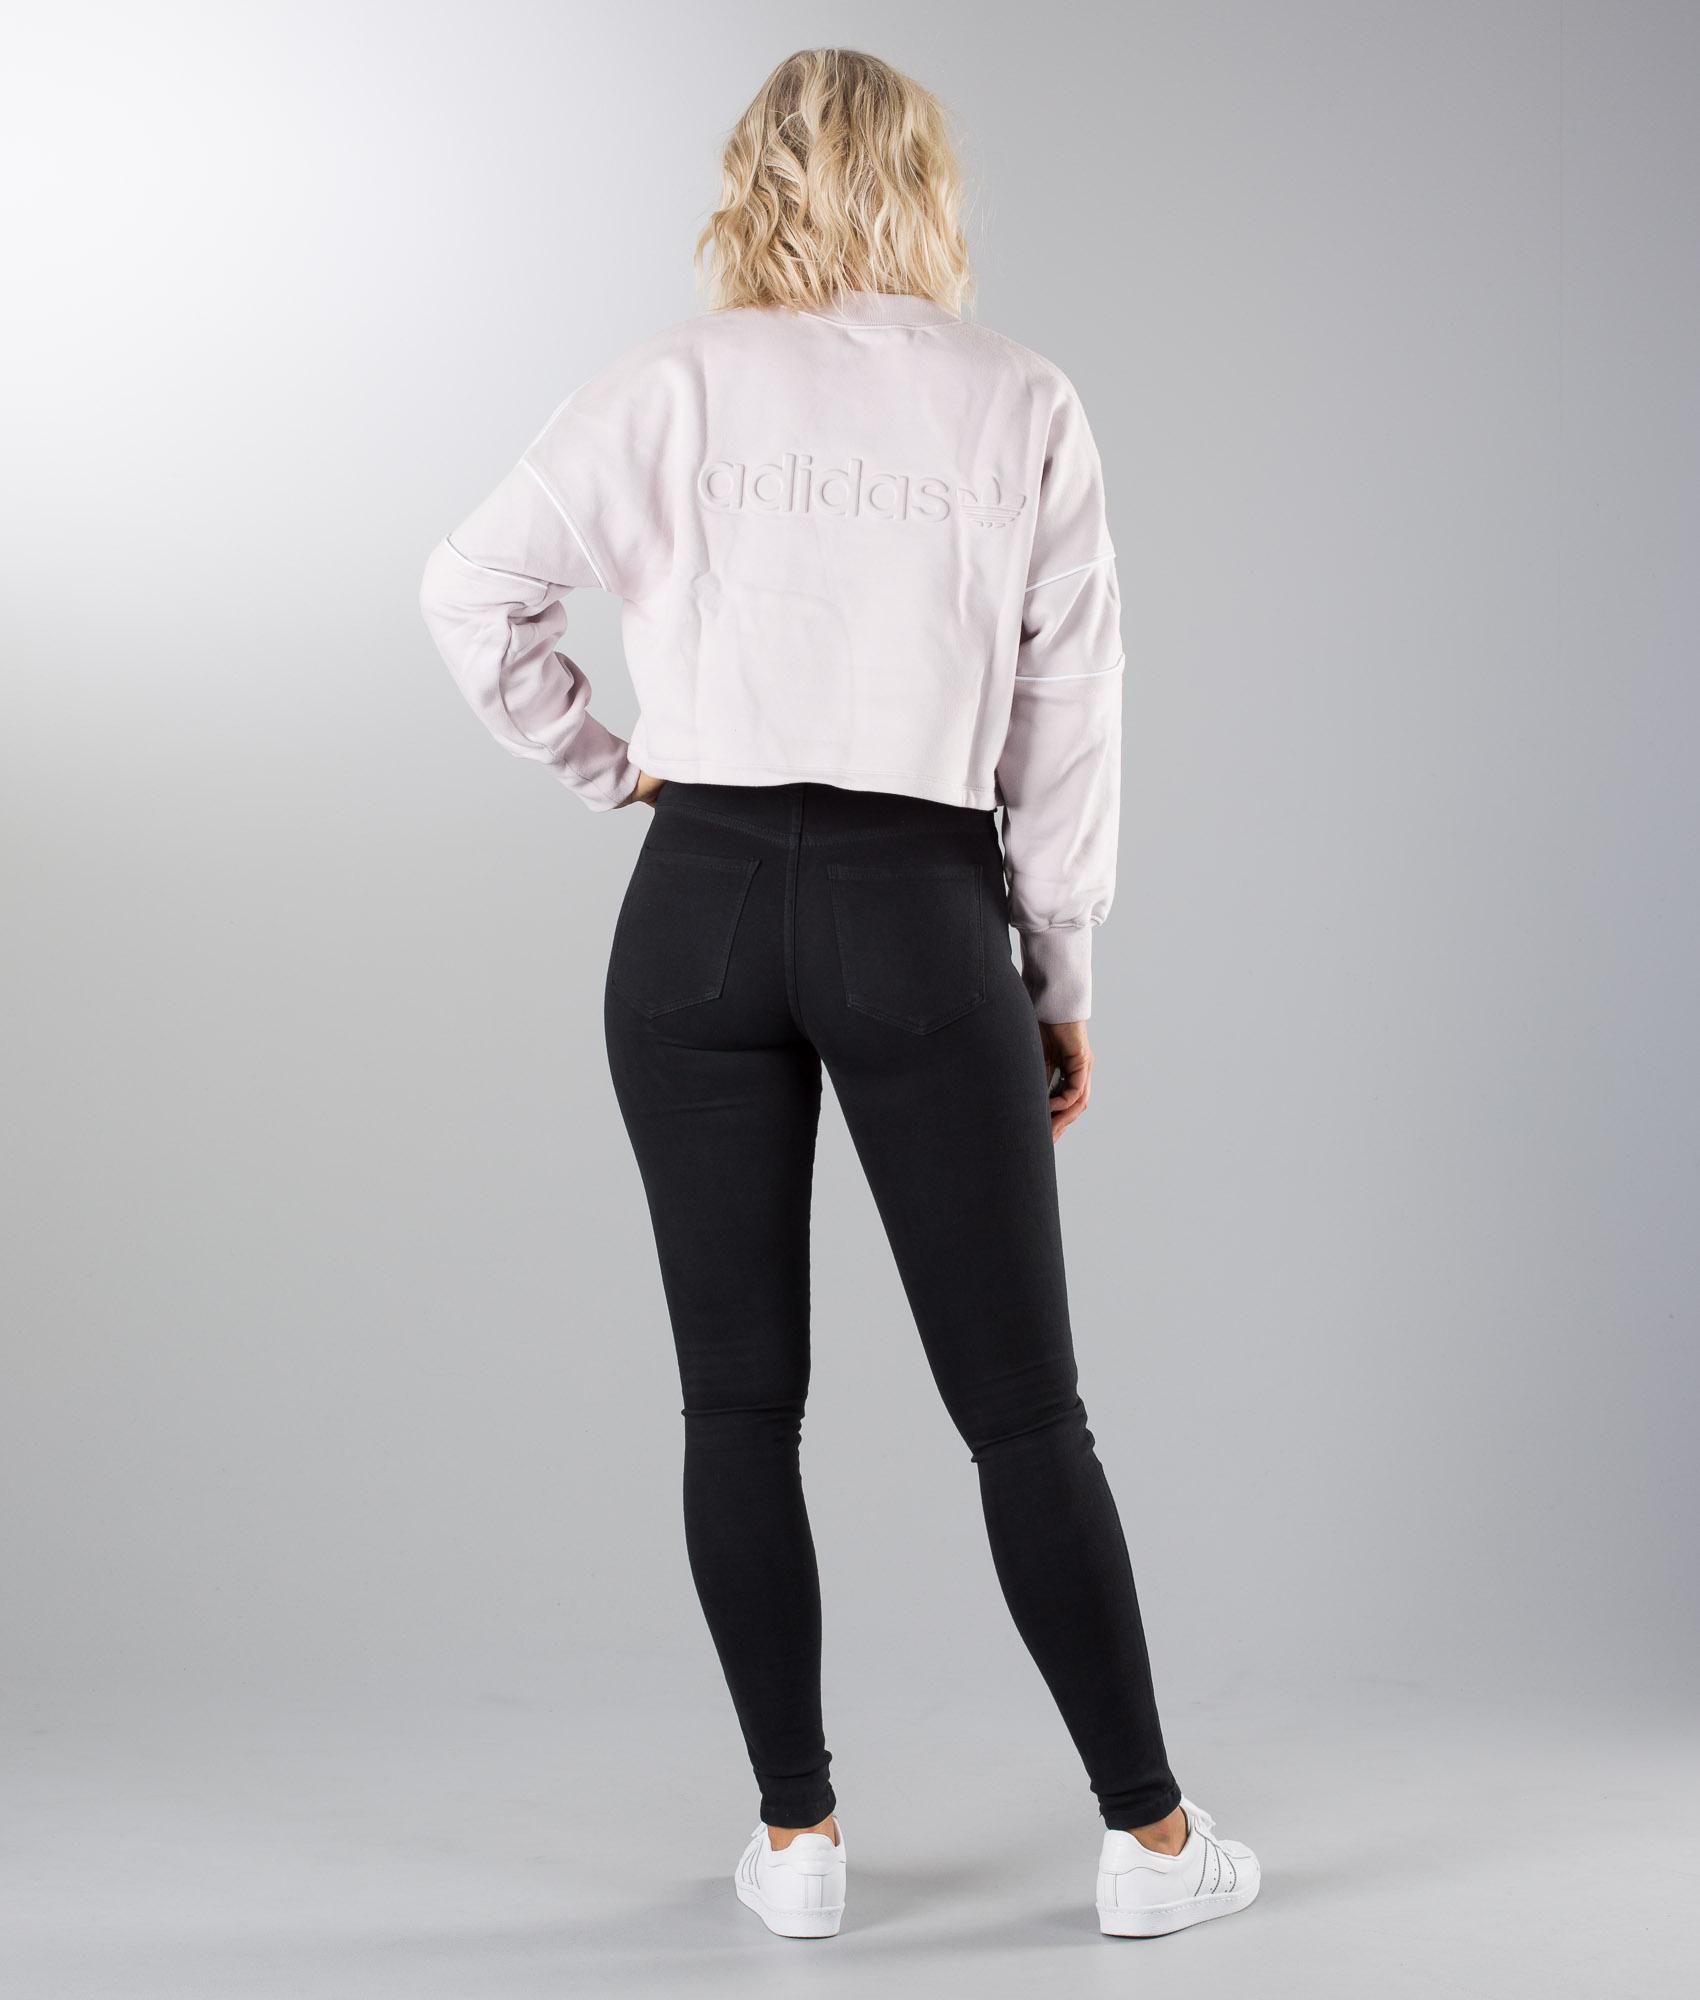 Adidas Originals Sweatshirt Gensere Ice Purple Ridestore